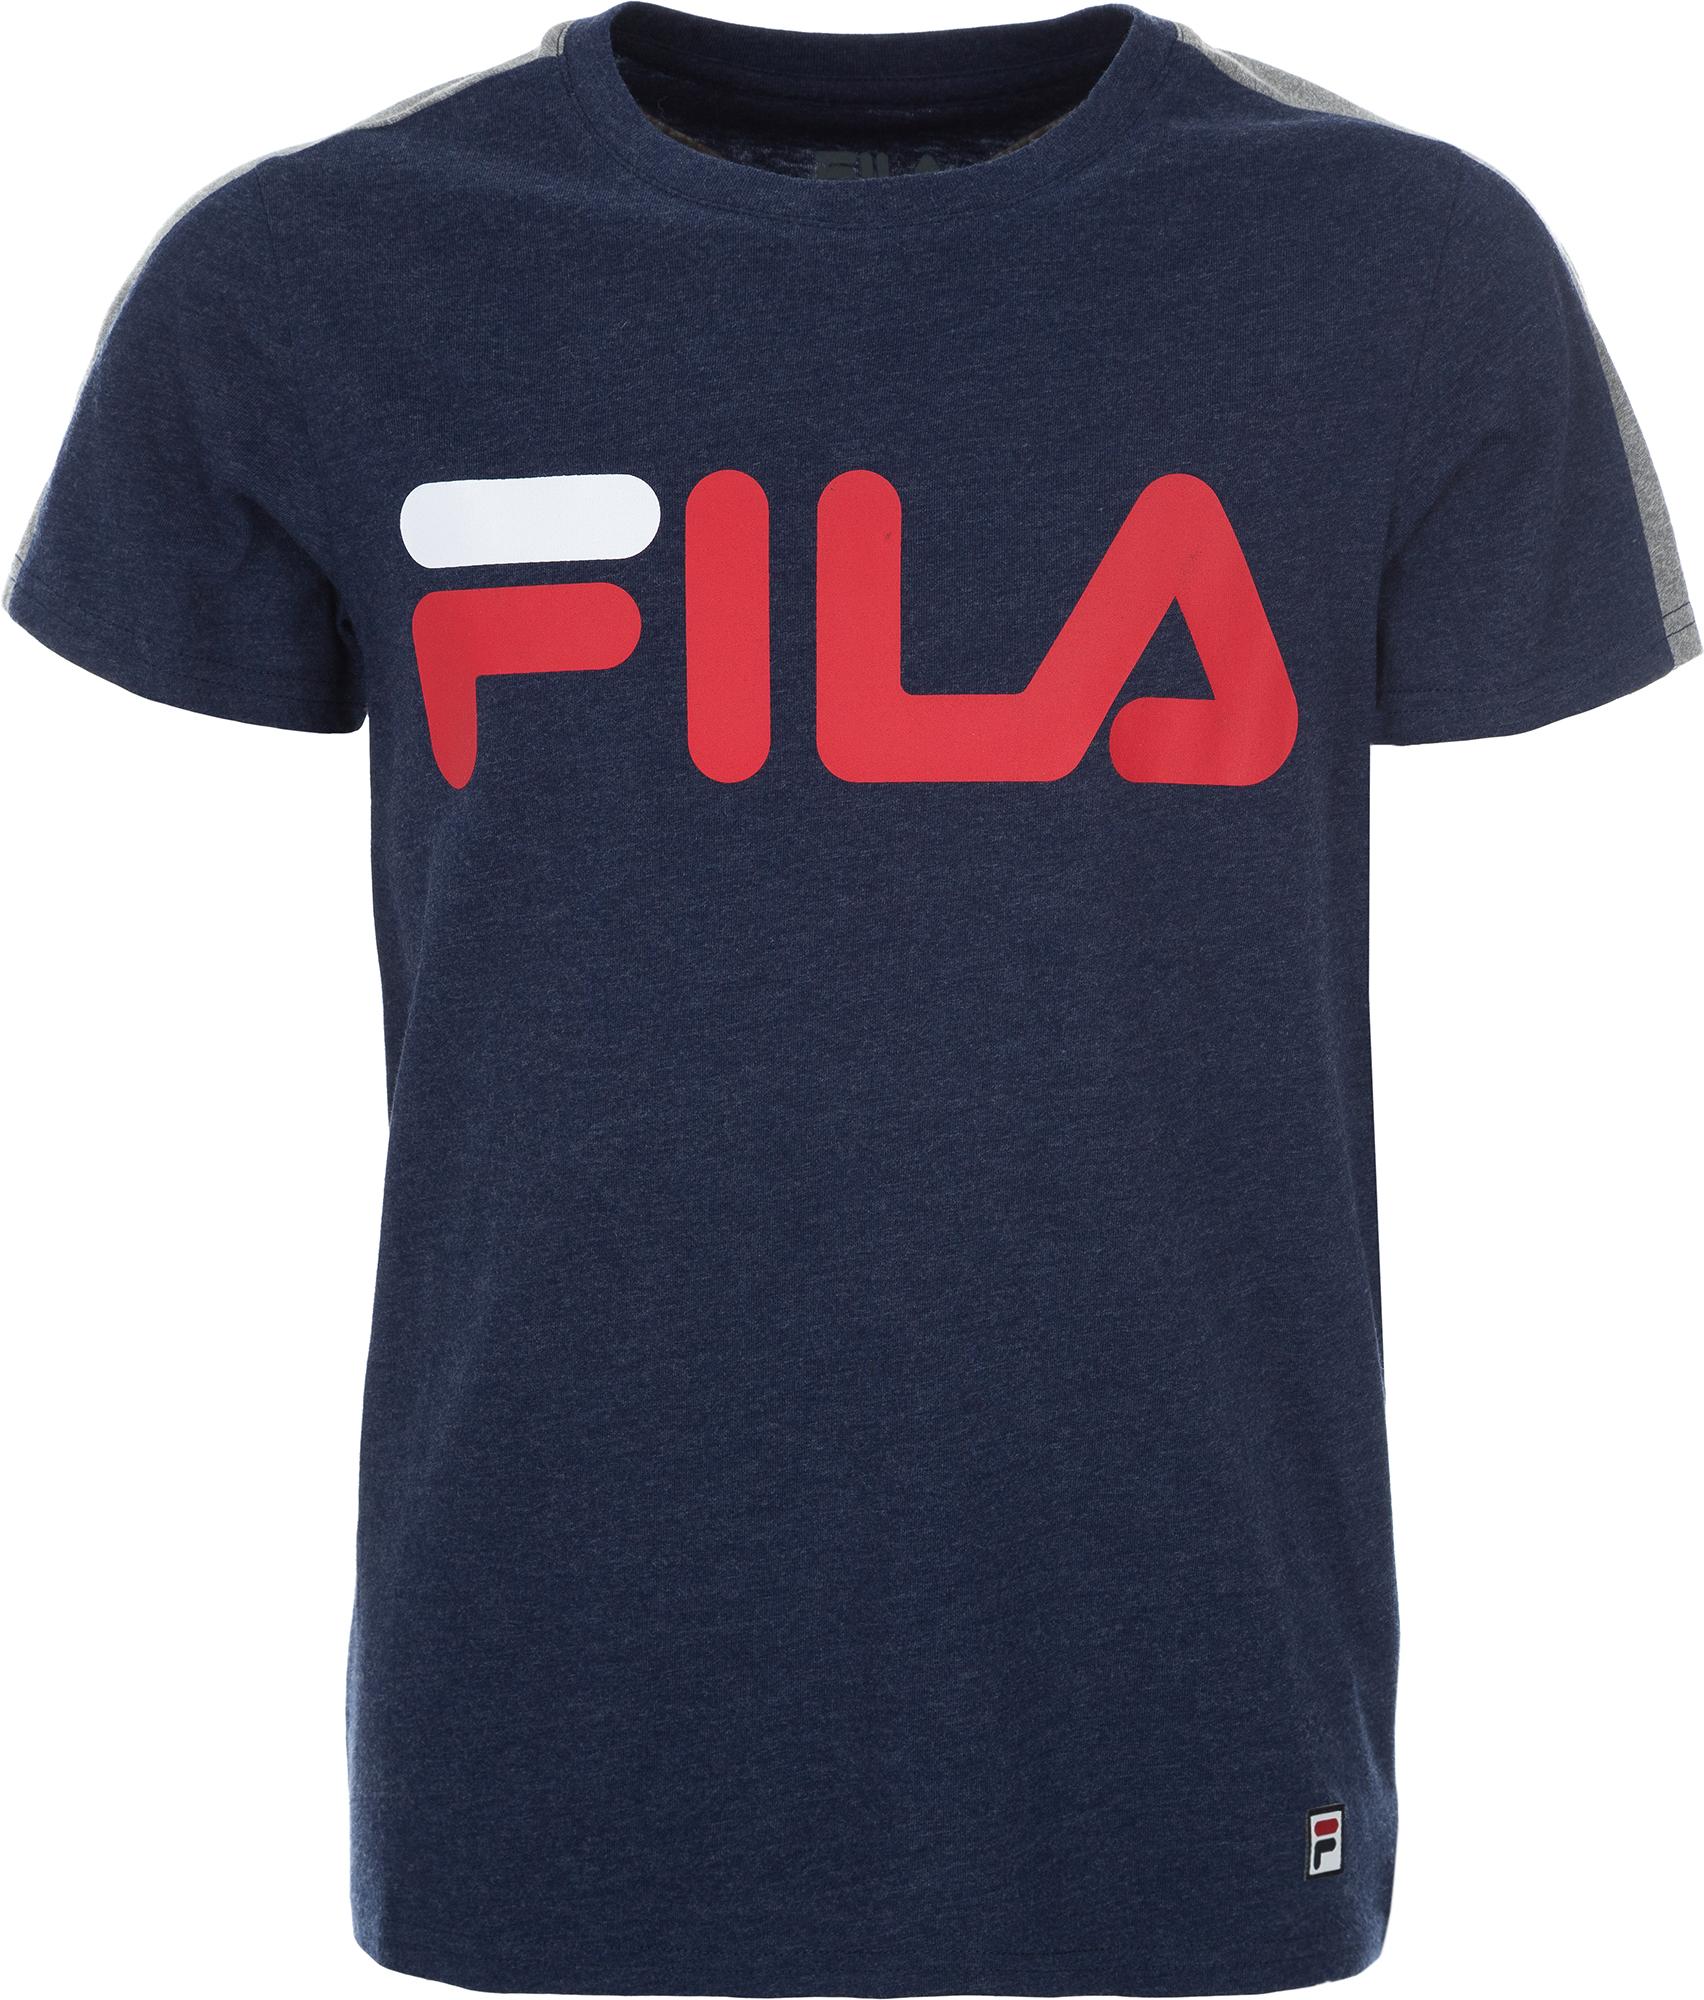 Fila Футболка для мальчиков Fila fila плавки шорты для мальчиков fila